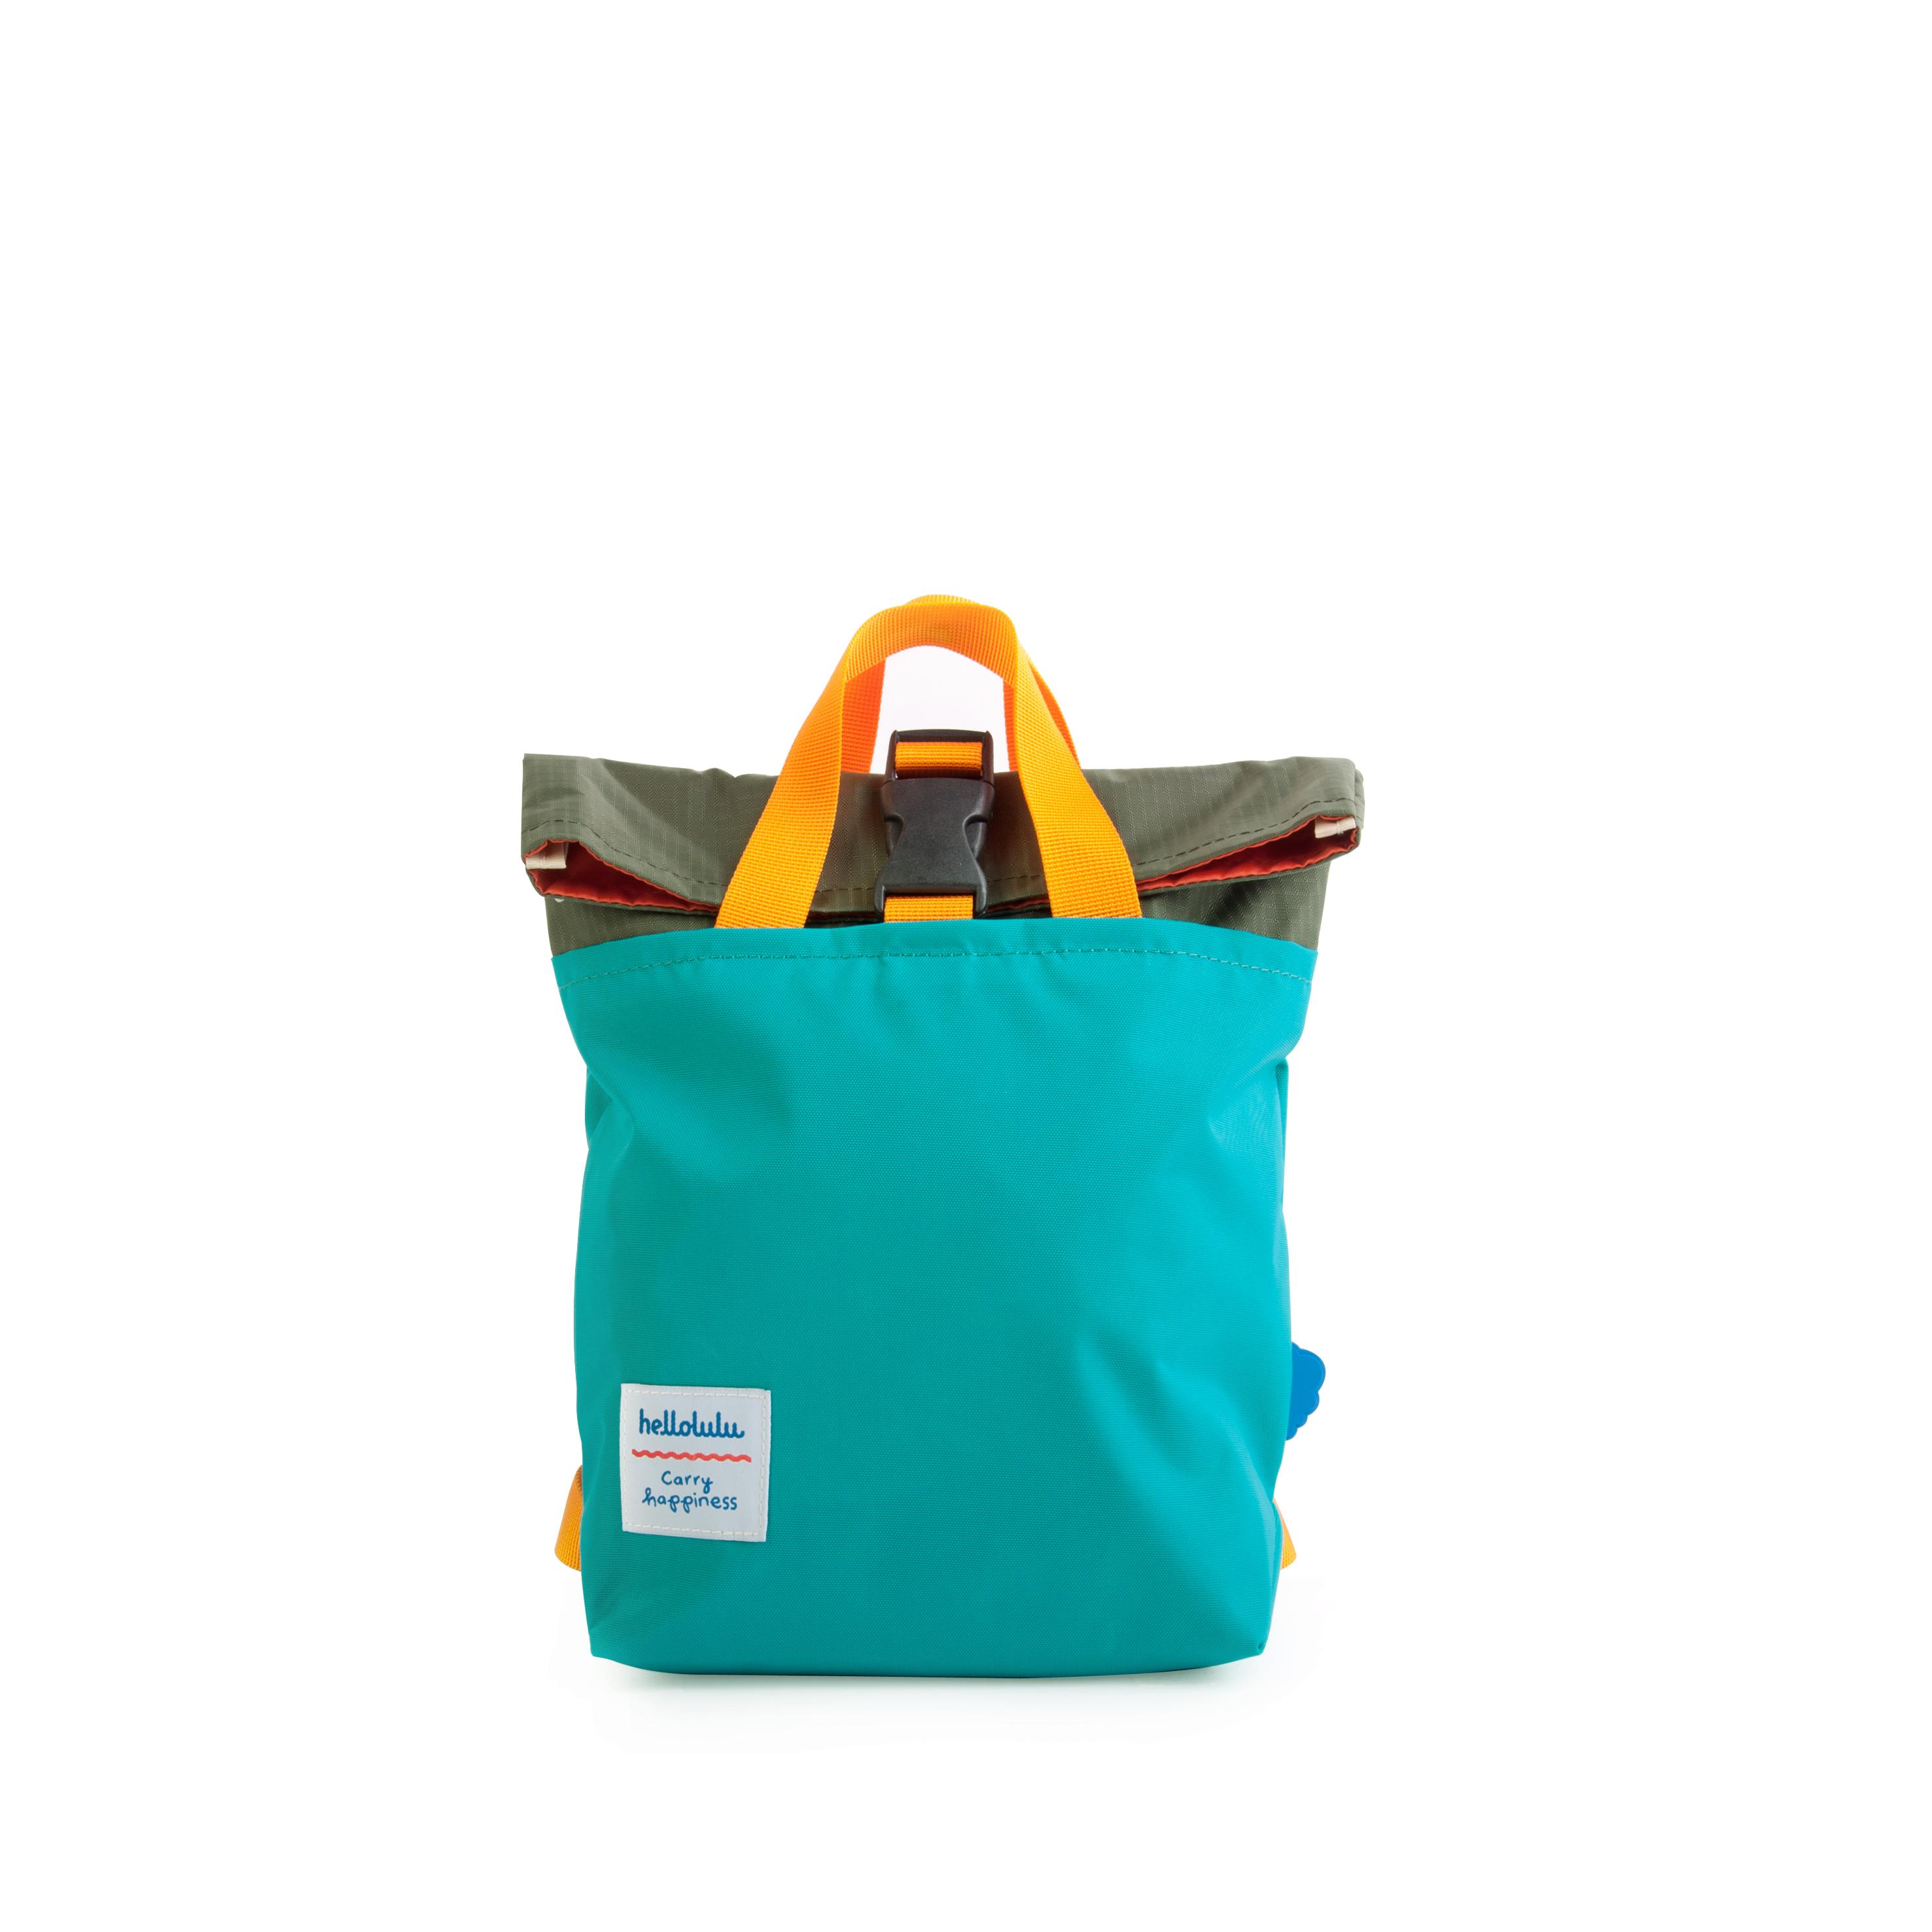 Hellolulu กระเป๋าเด็ก รุ่น JAZPER - Olive/Lake Green